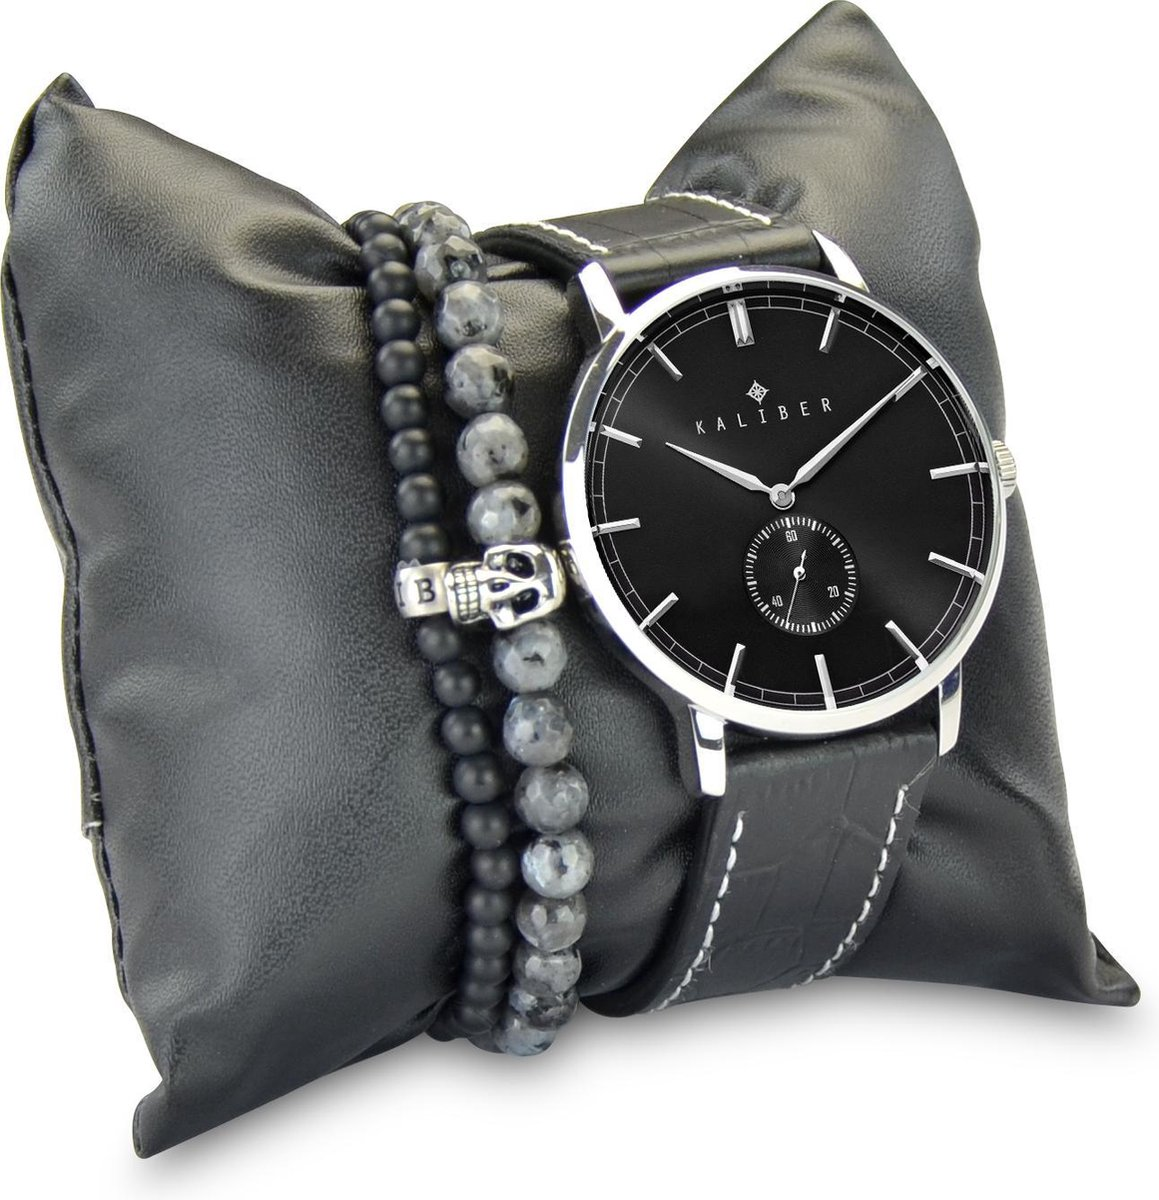 Kaliber 7KA SET012 Horloge Set met Armbanden - Leren Band - Ø 40 mm - Zwart / Zilverkleurig - Kaliber